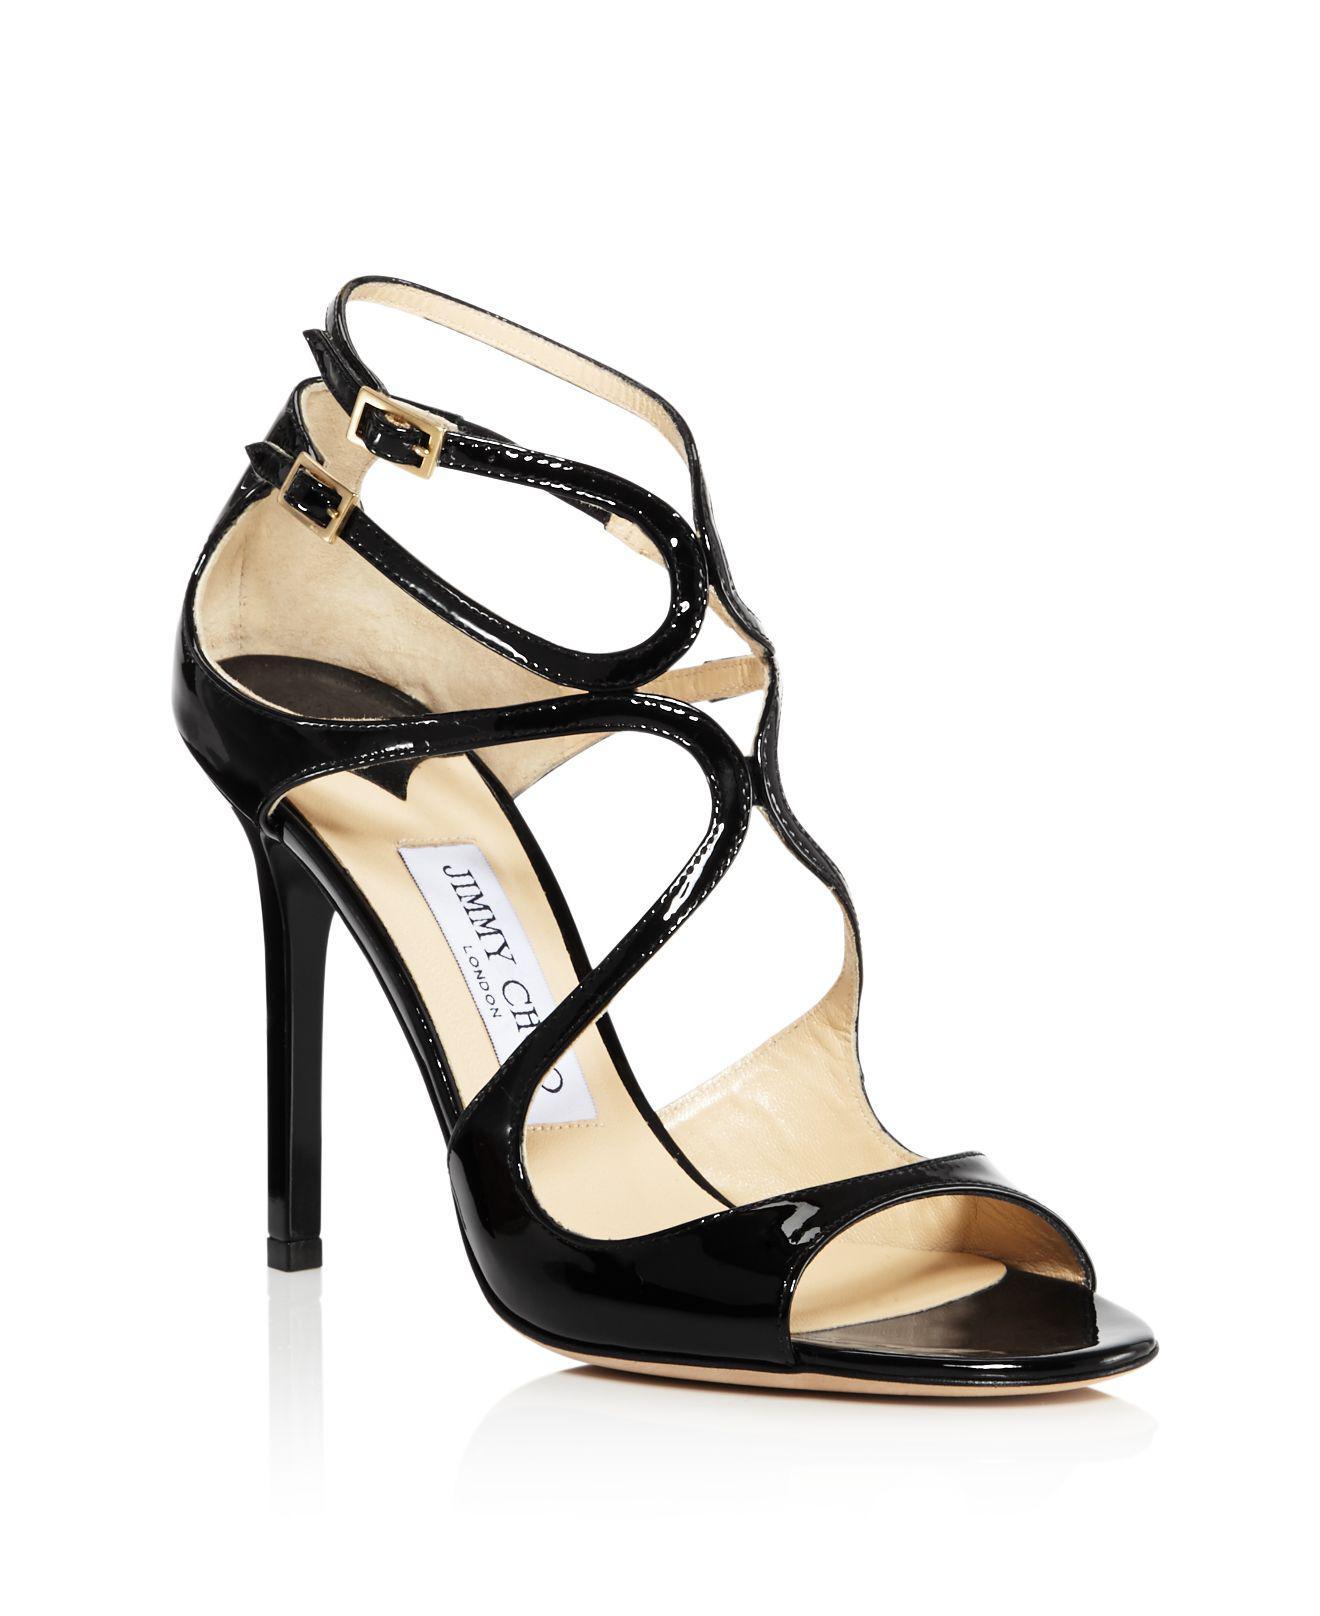 Jimmy choo Women's Lang 100 Crackled Metallic Leather High-Heel Sandals t2NaaQKhga